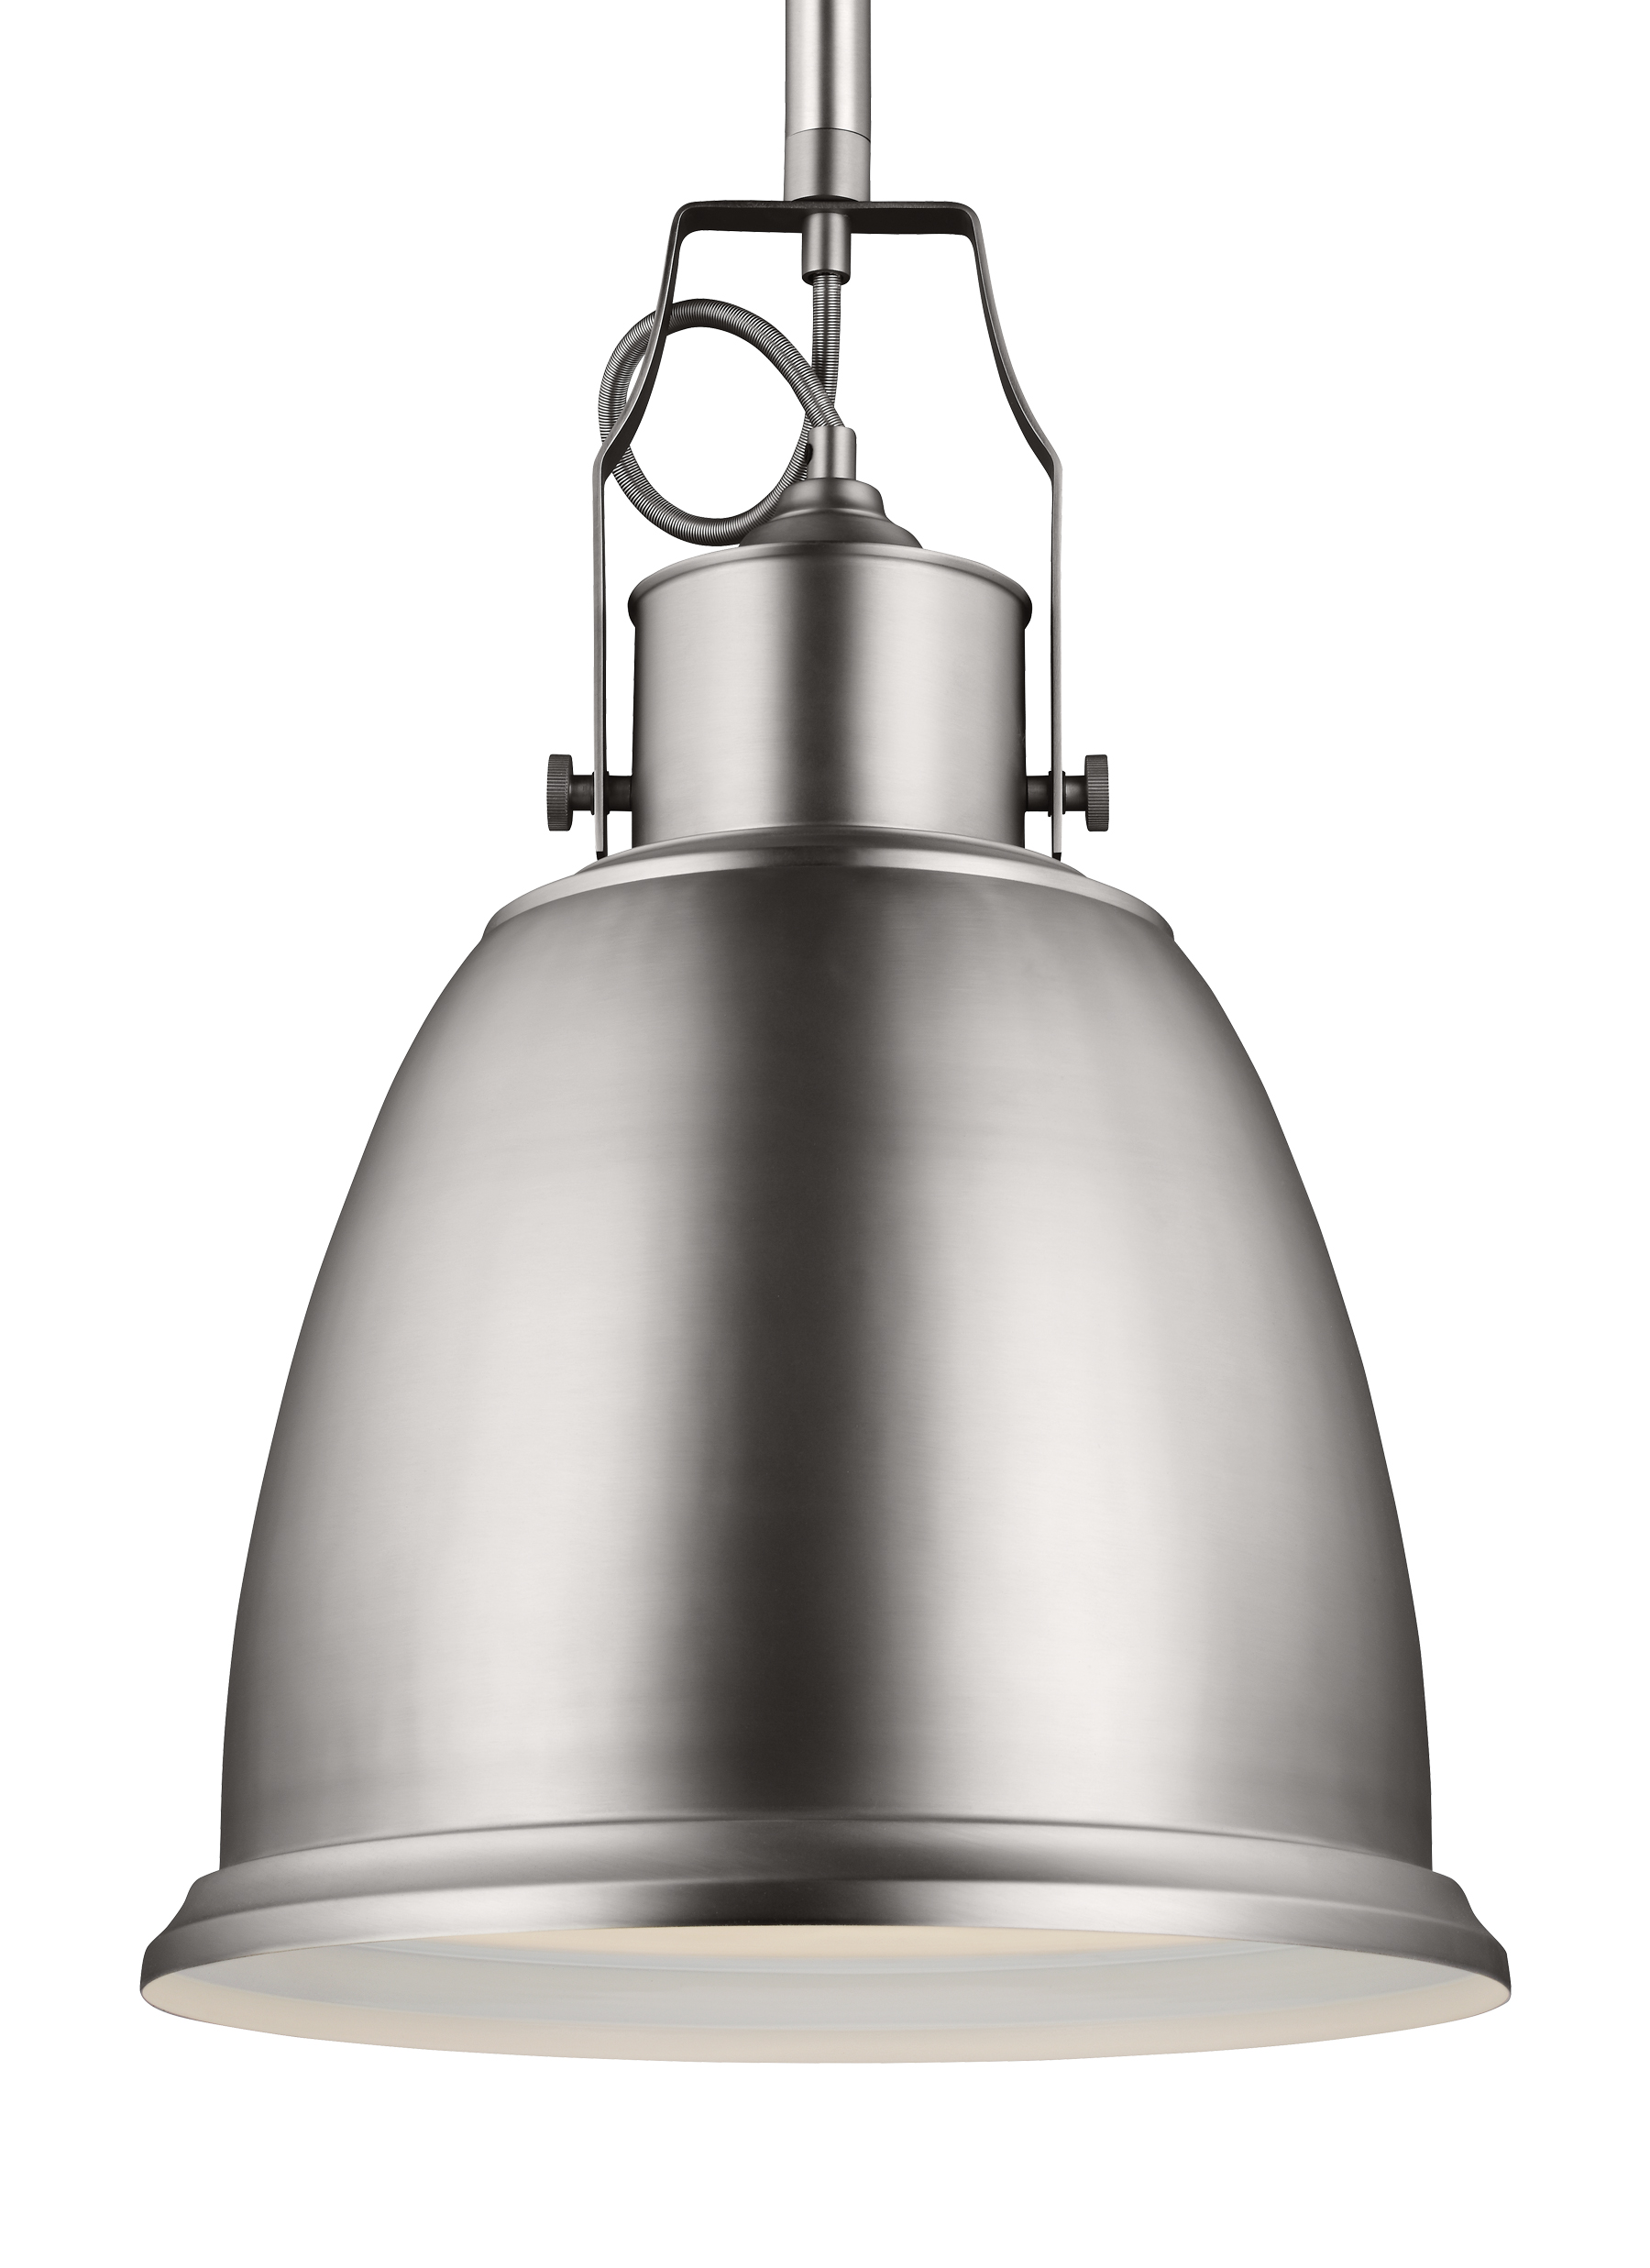 P1359sn 1 Light Pendant Satin Nickel